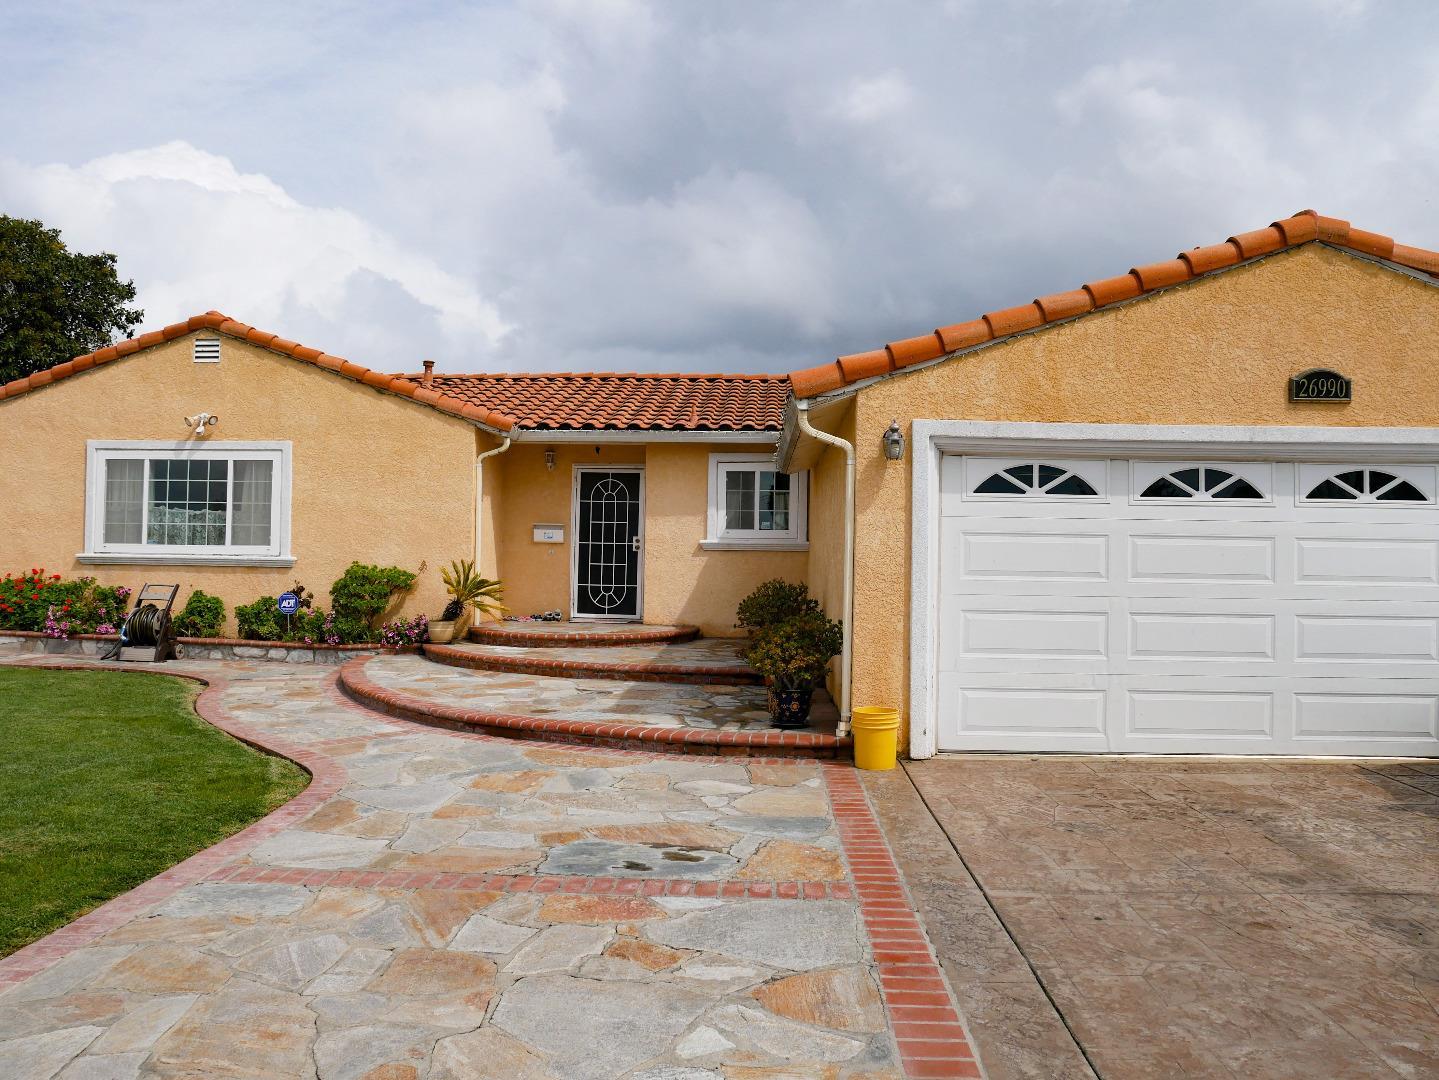 Single Family Home for Sale at 26990 Jennings Way 26990 Jennings Way Hayward, California 94544 United States